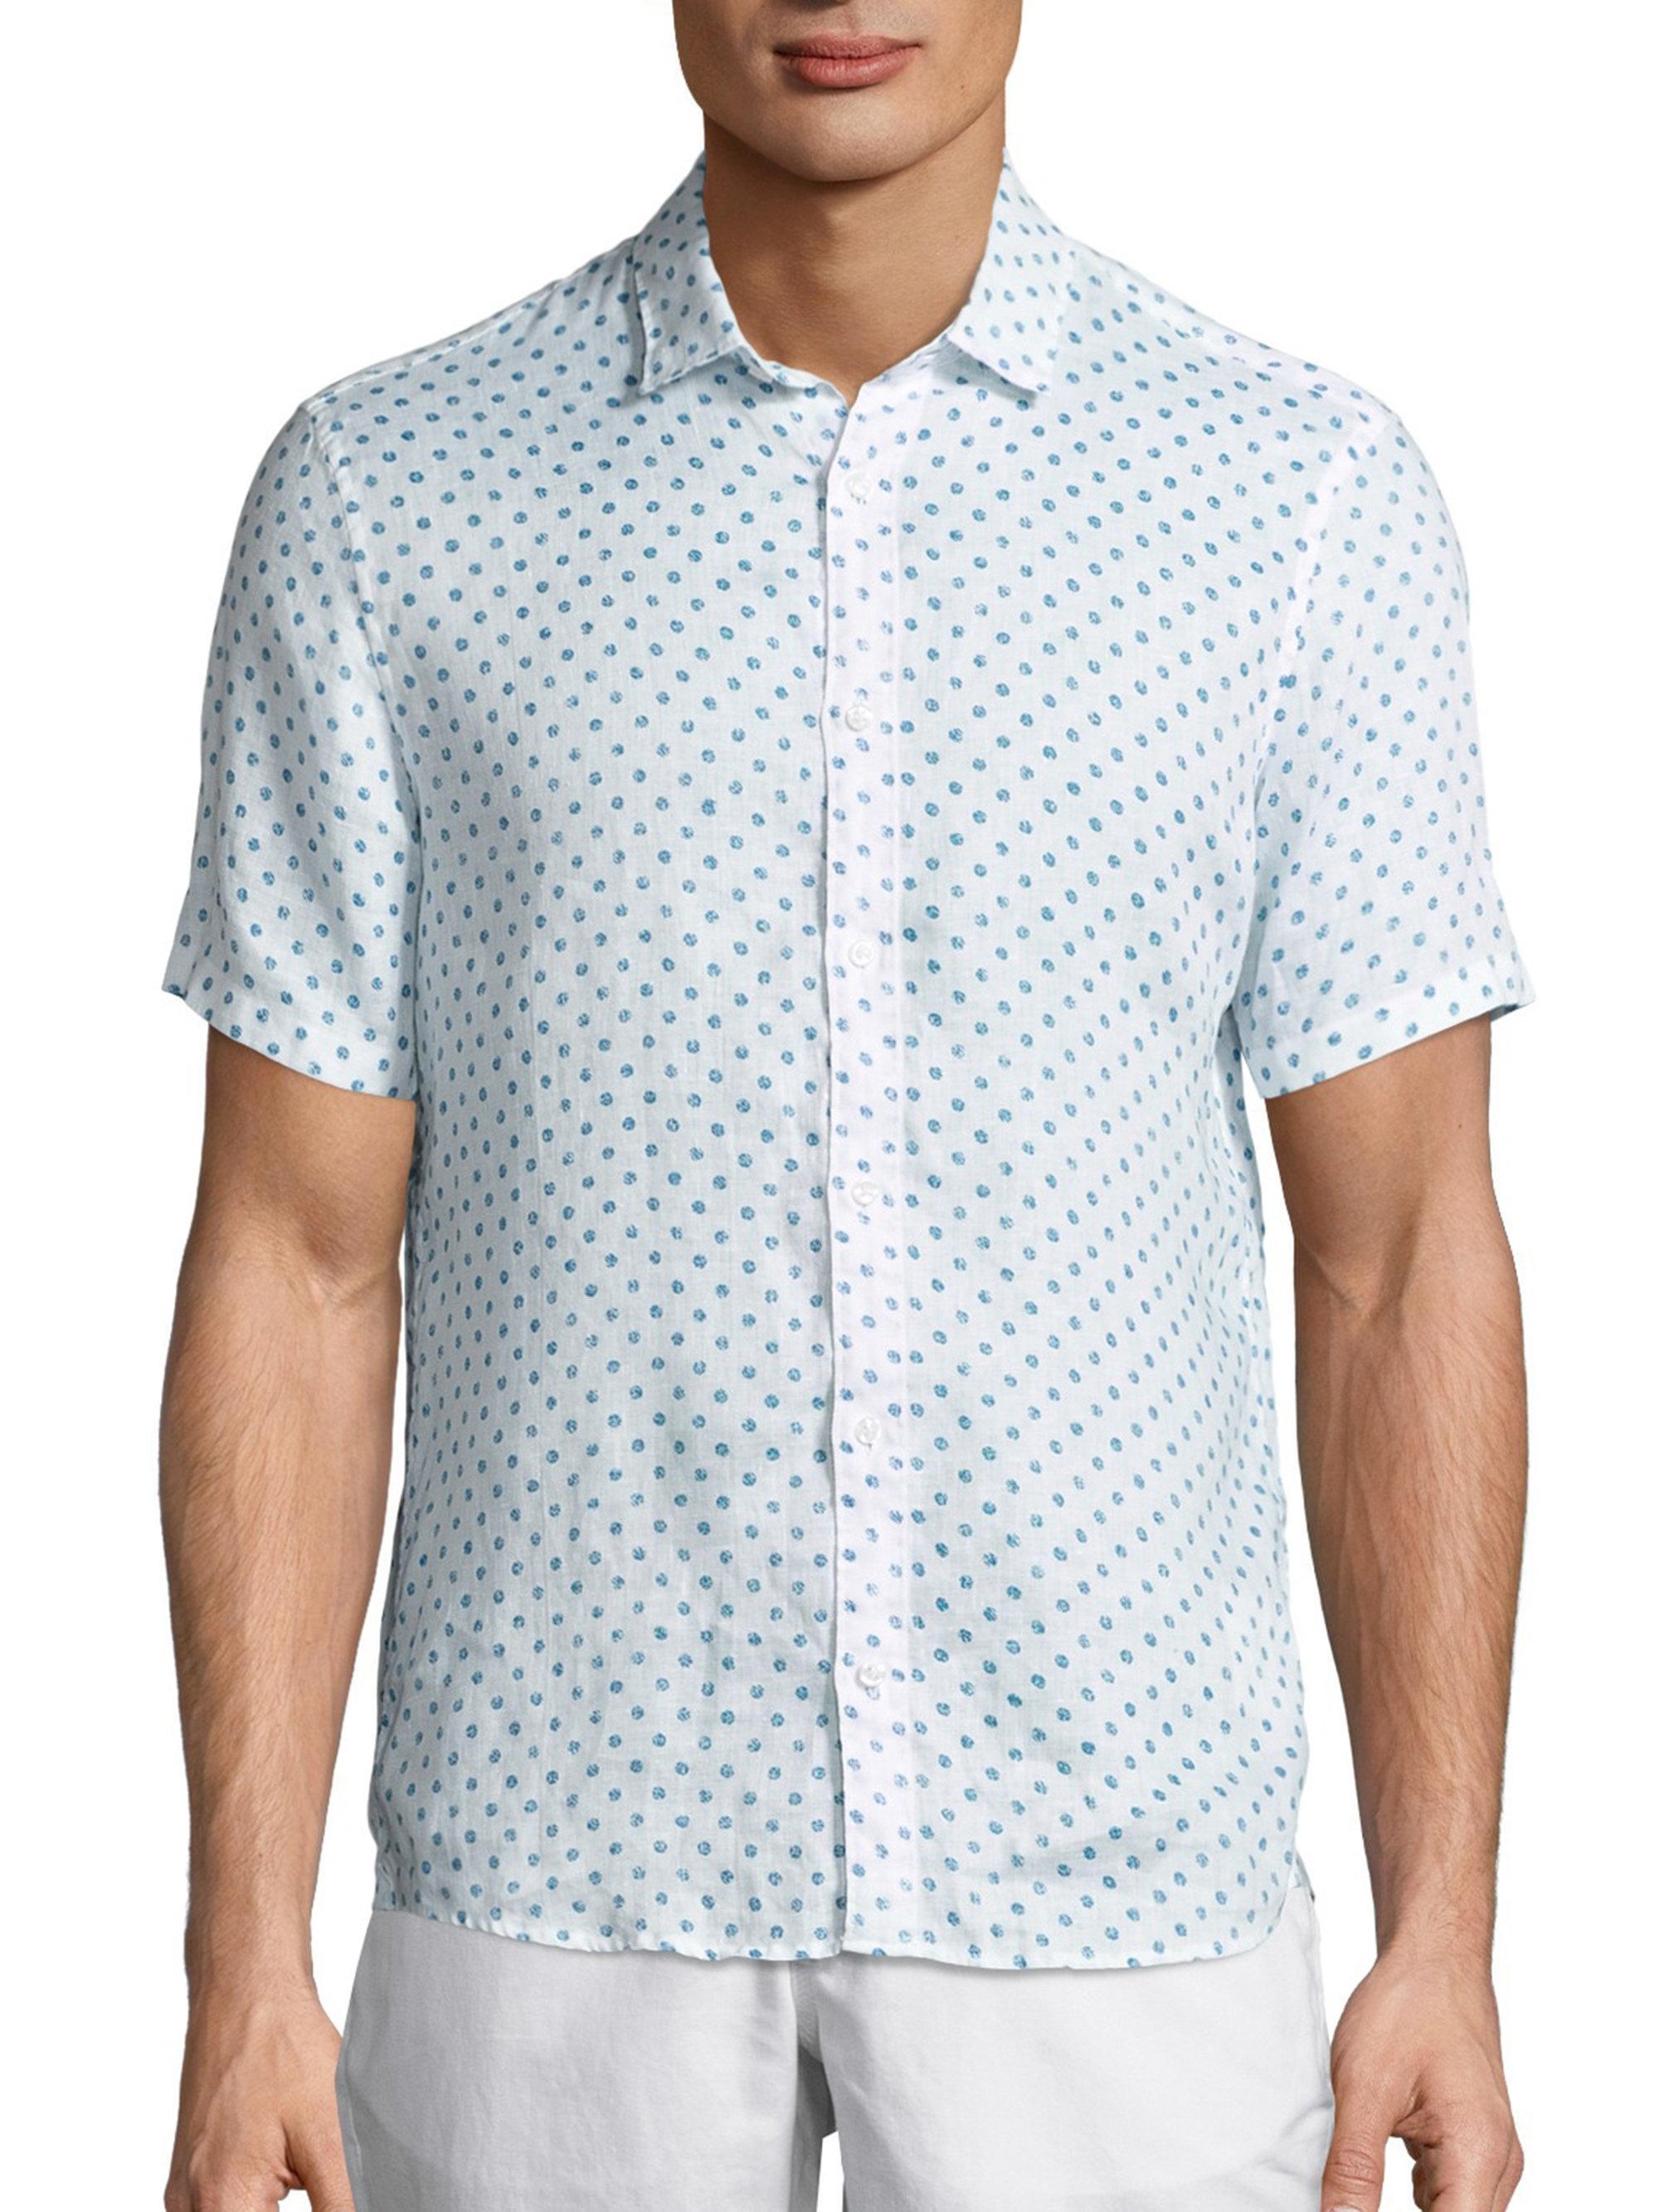 Michael Kors Mason Slim Fit Shirt In Blue For Men Lyst